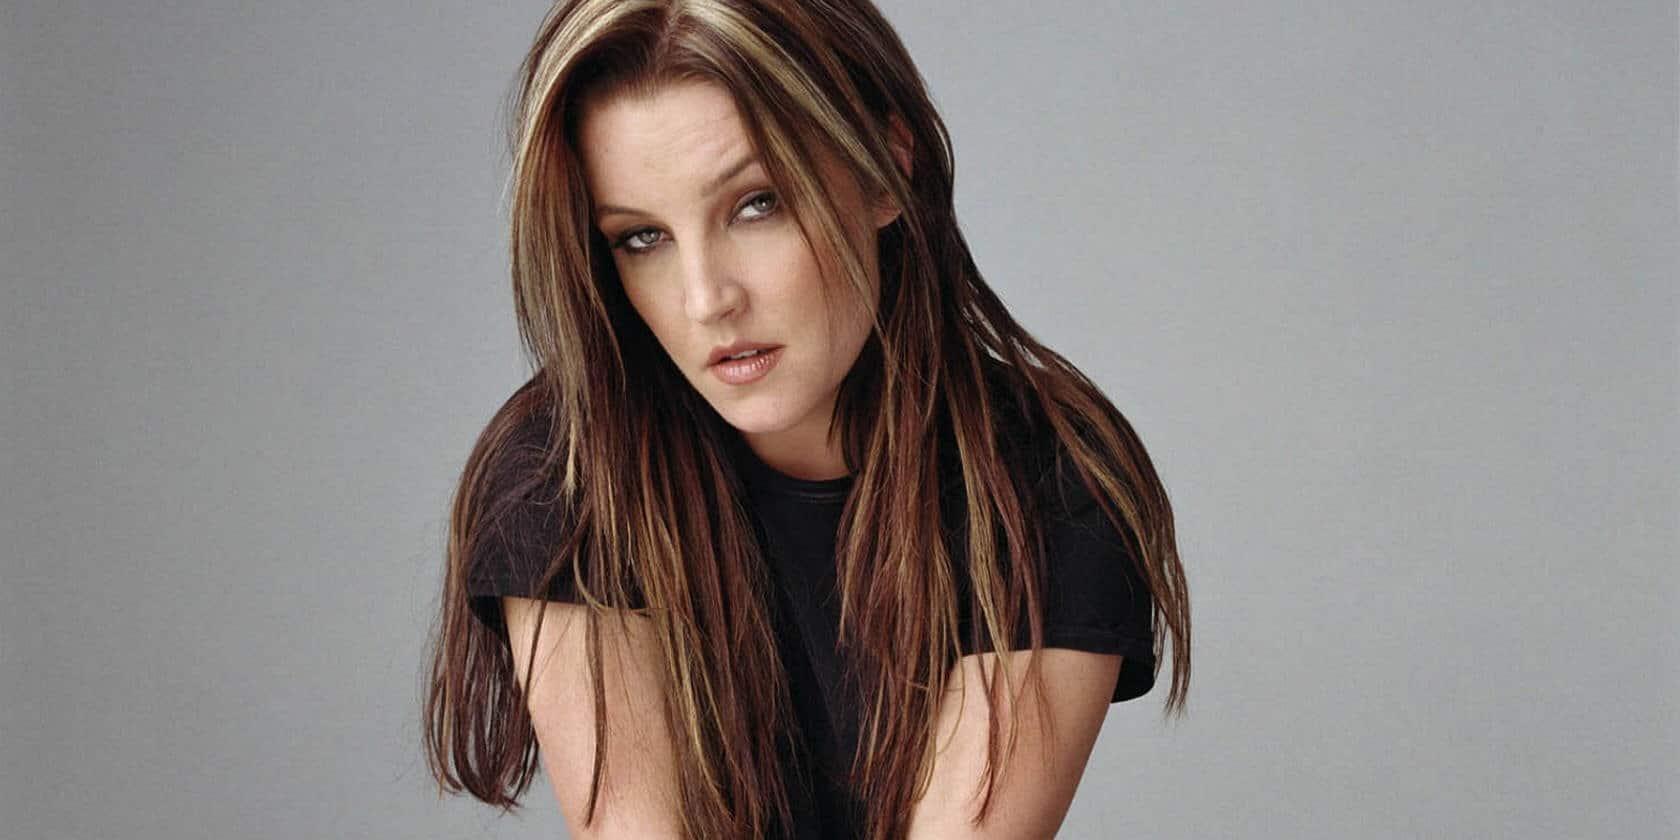 Lisa marie presley net worth celebrity net worth harper vivienne ann